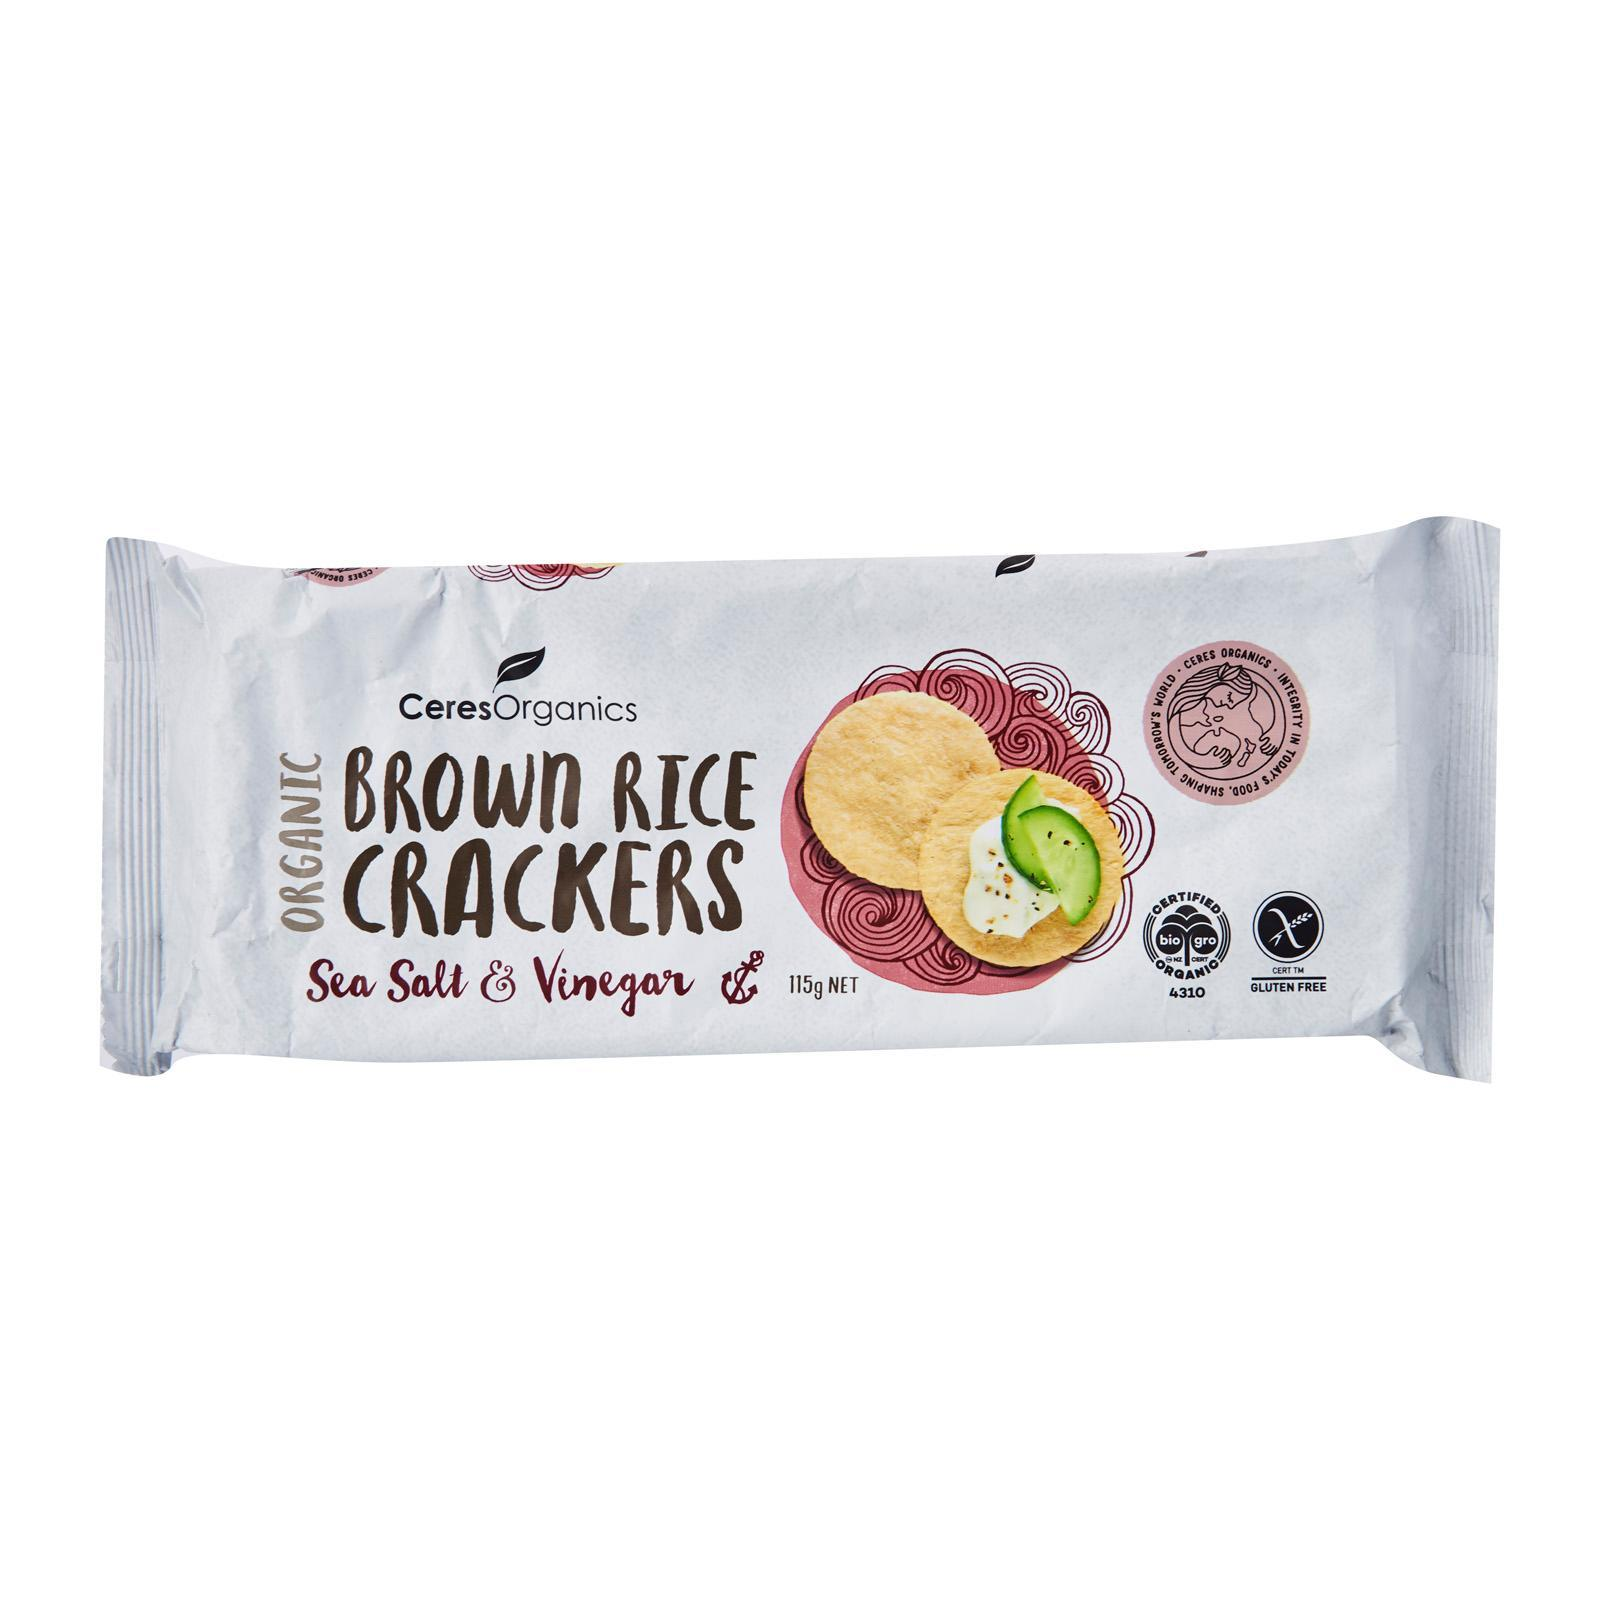 CERES ORGANICS Brown Rice Crackers Sea Salt and Vinegar - by Optimo Foods